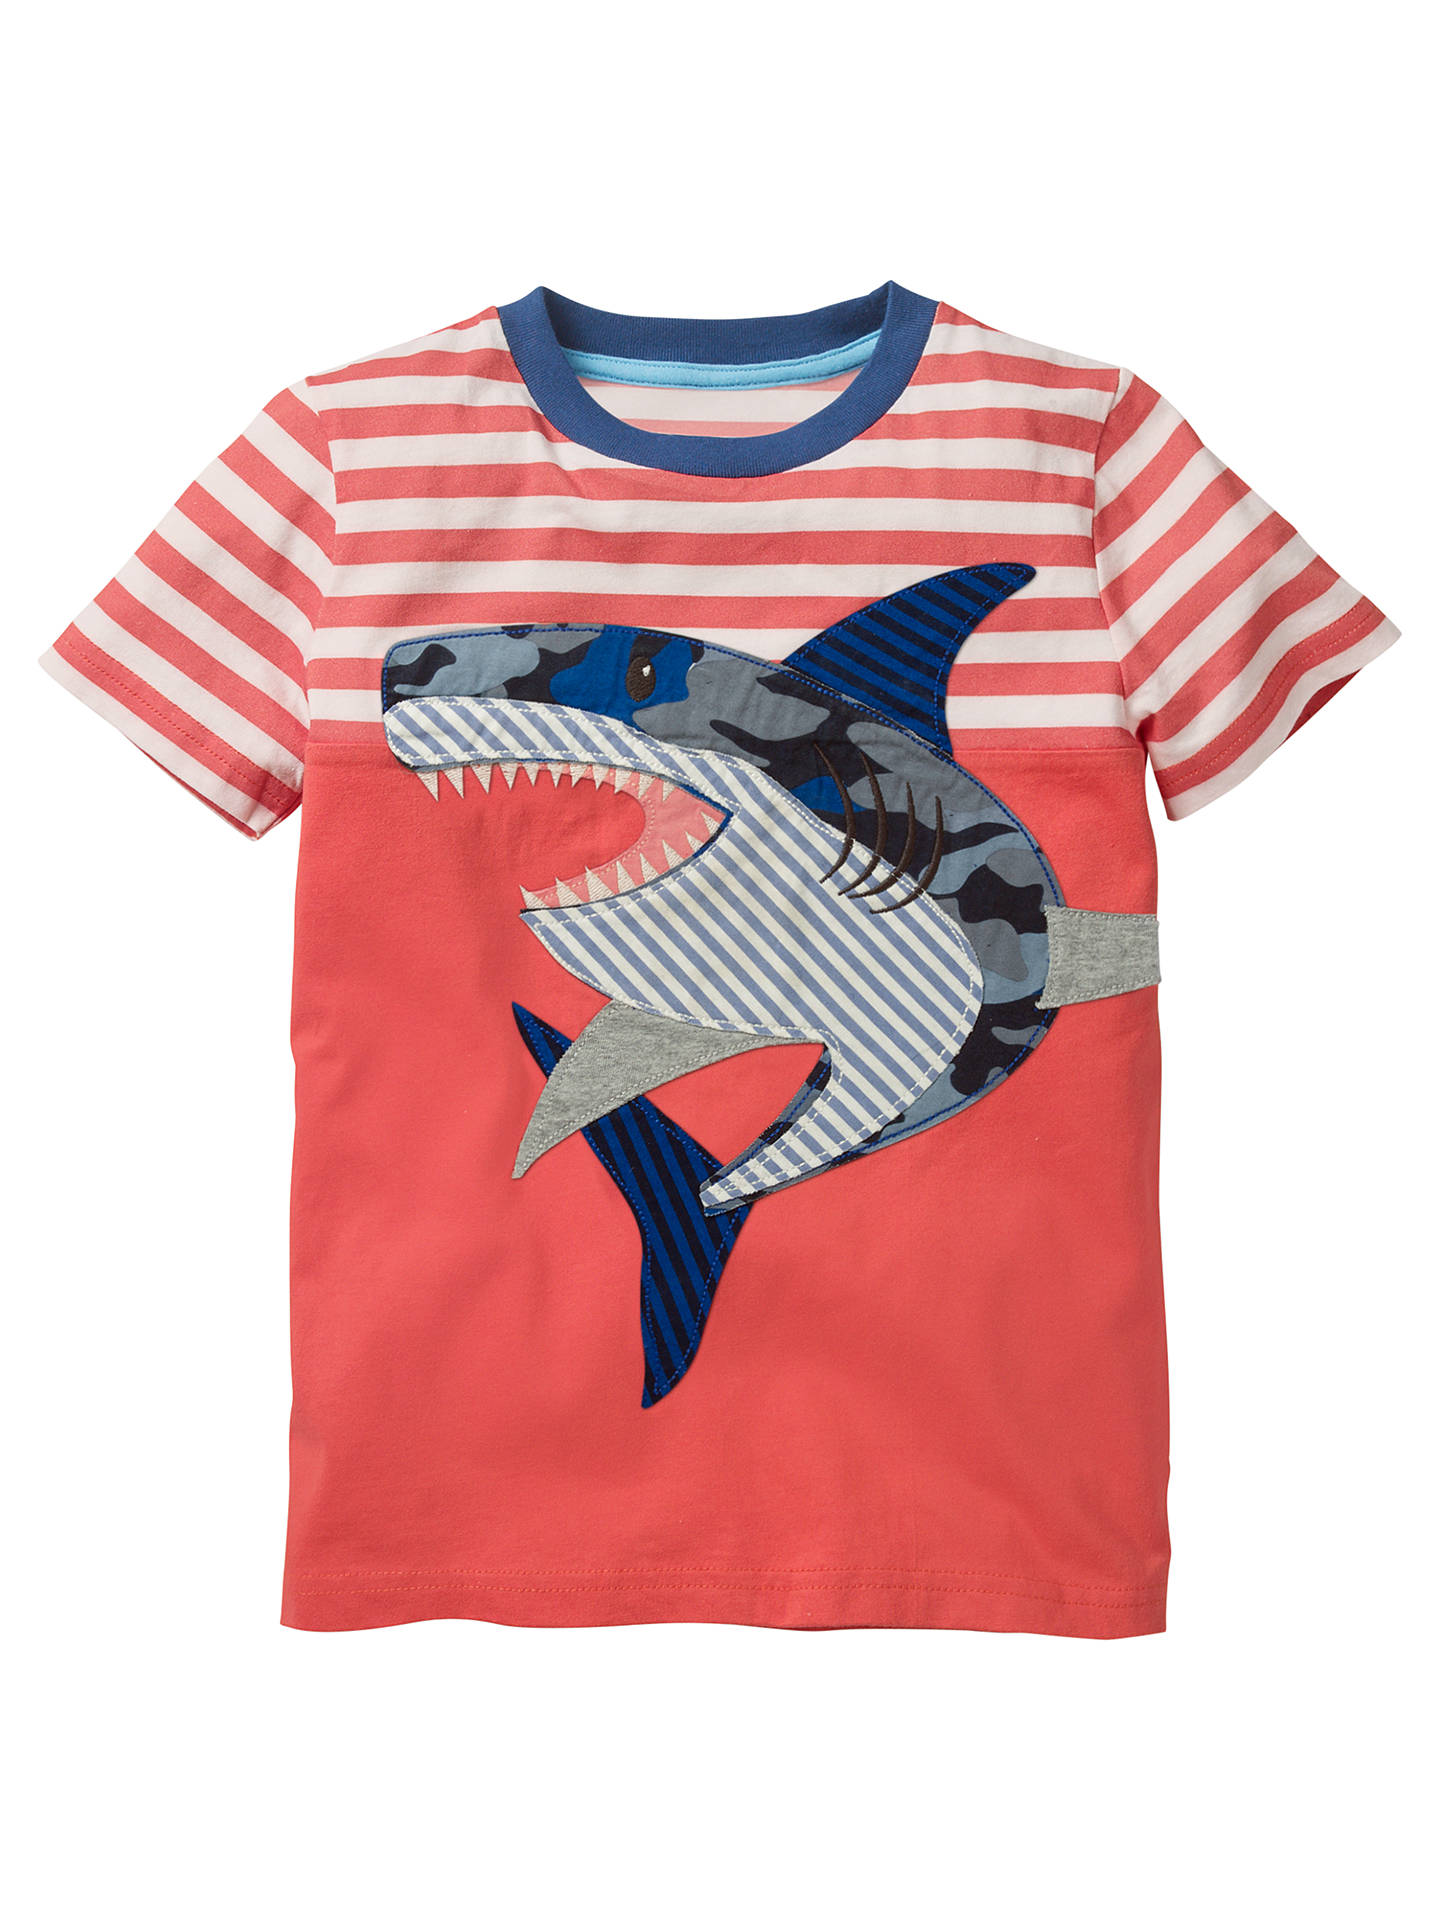 a4d3fed0b6 Mini Boden Boys' Striped Applique Shark T-Shirt, Red at John Lewis ...